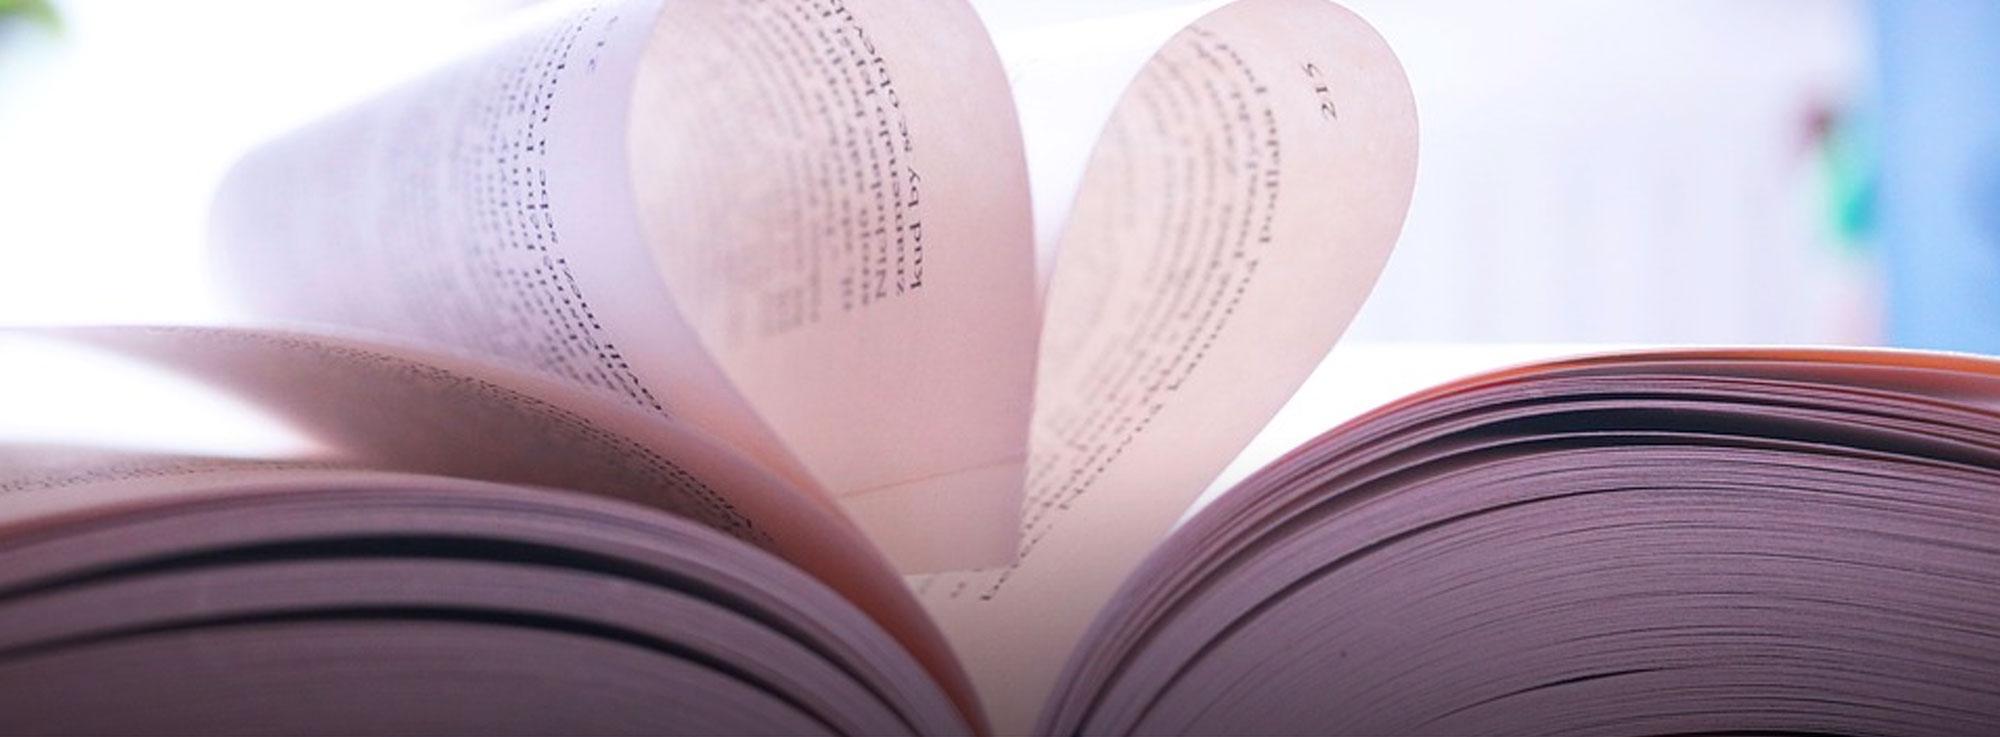 Taranto: Taranto due mari di libri